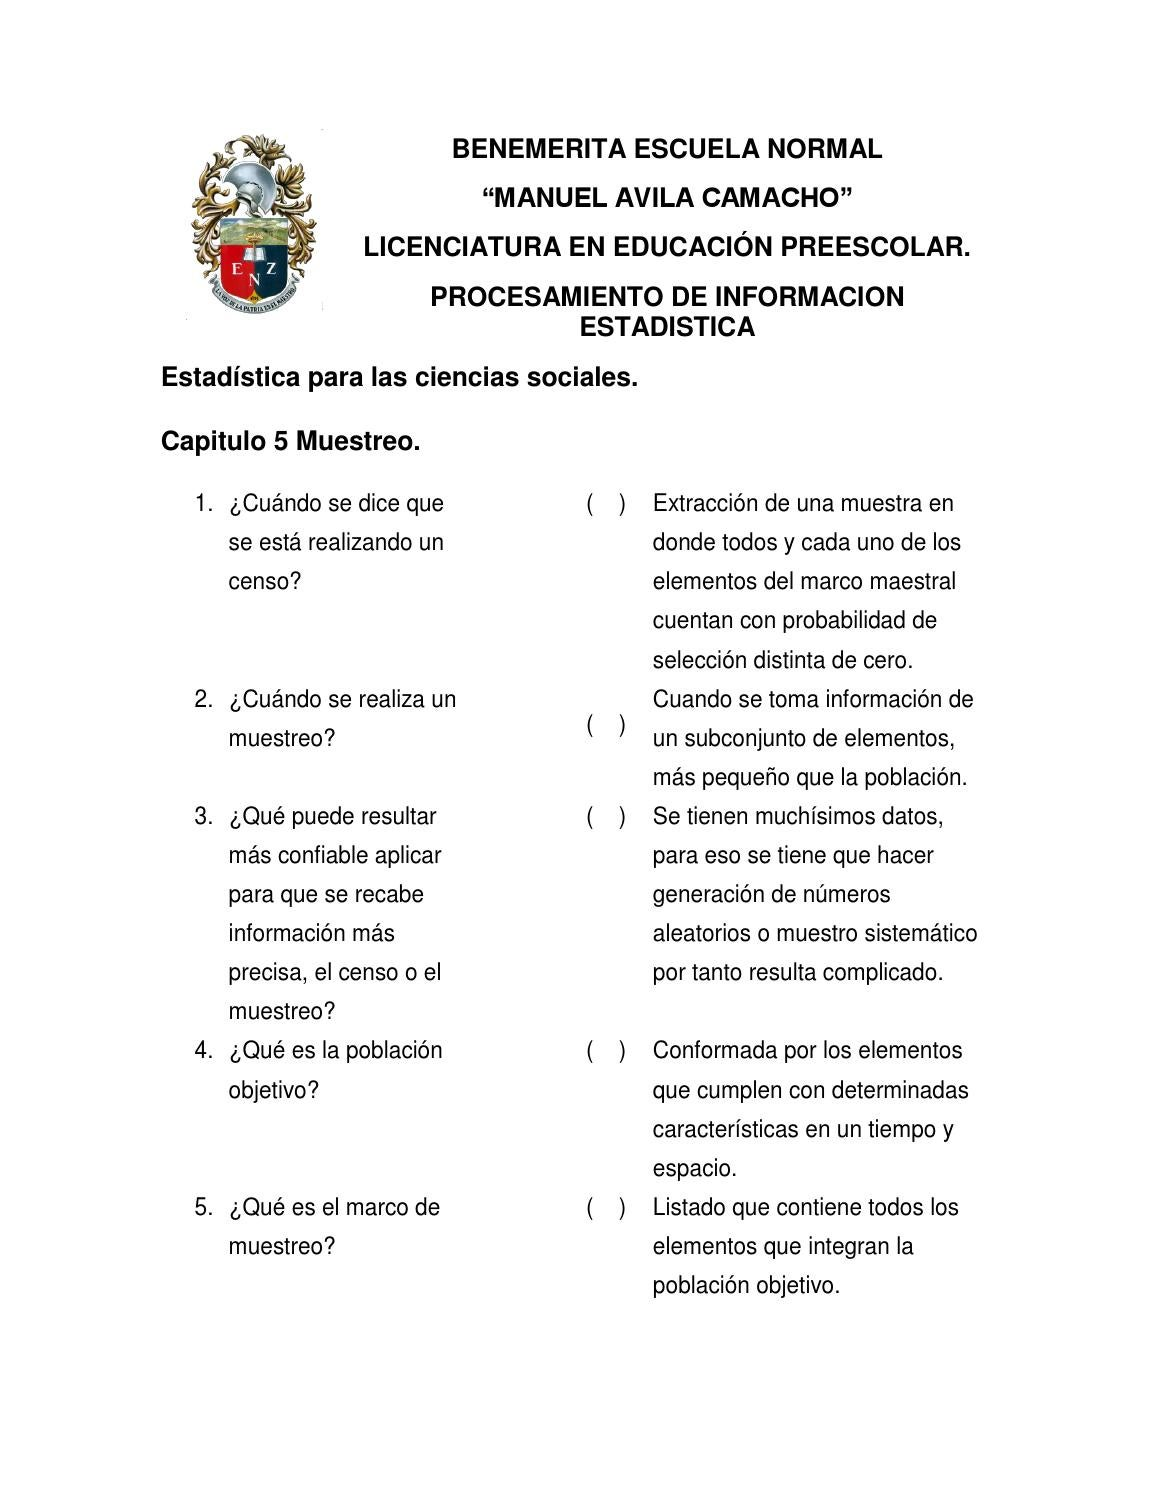 Examen capitulo 5 muestreo preguntas by Giovanna - issuu